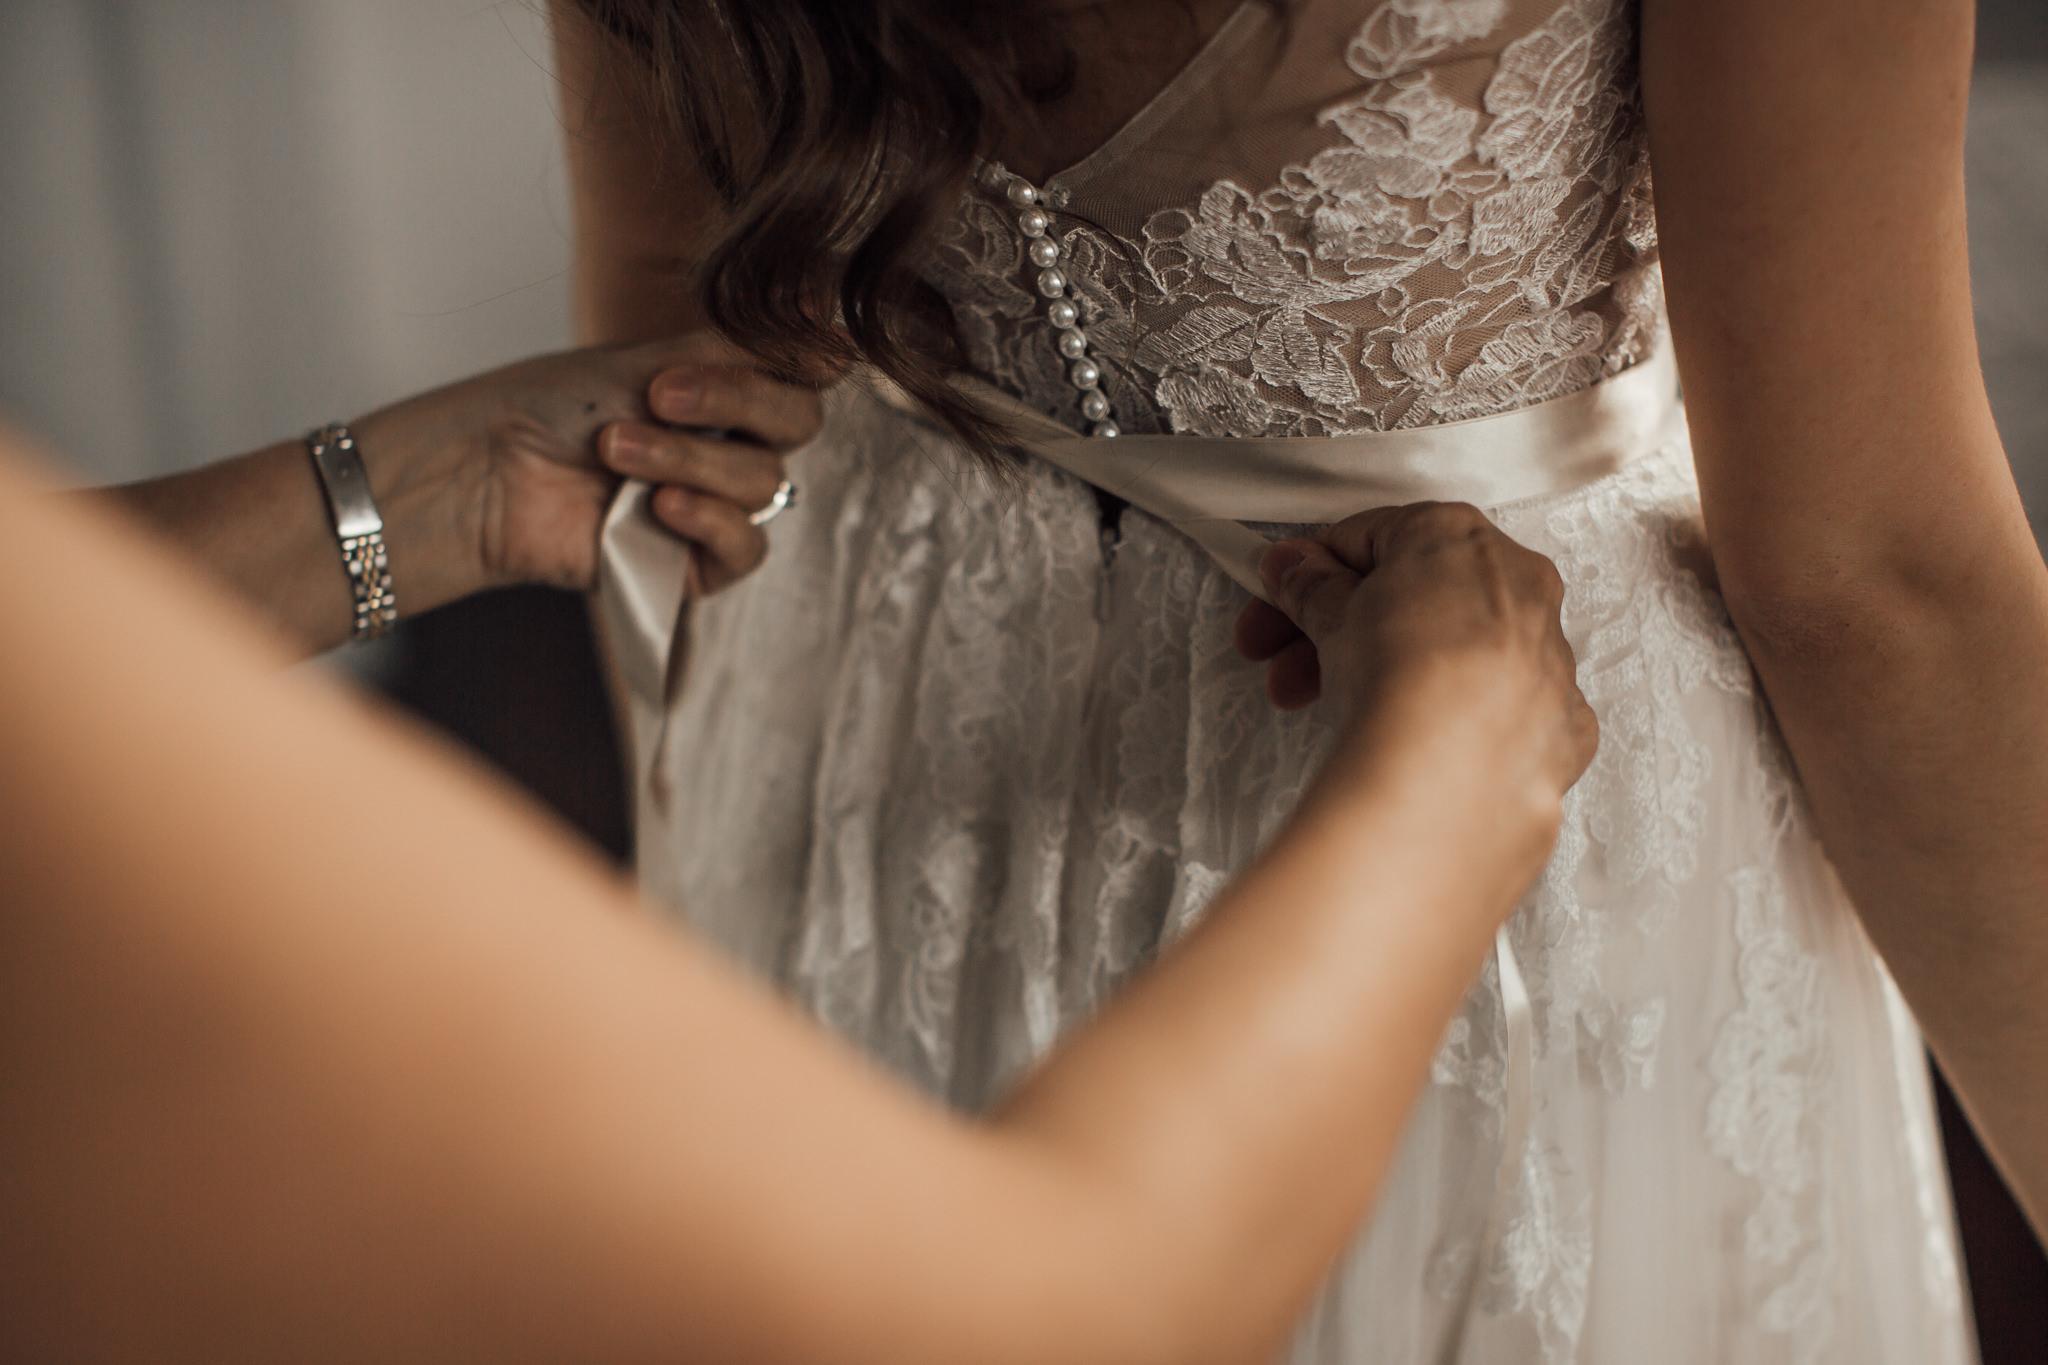 cassie-cook-photography-memphis-wedding-photographer-the-atrium-at-overton-square-10.jpg